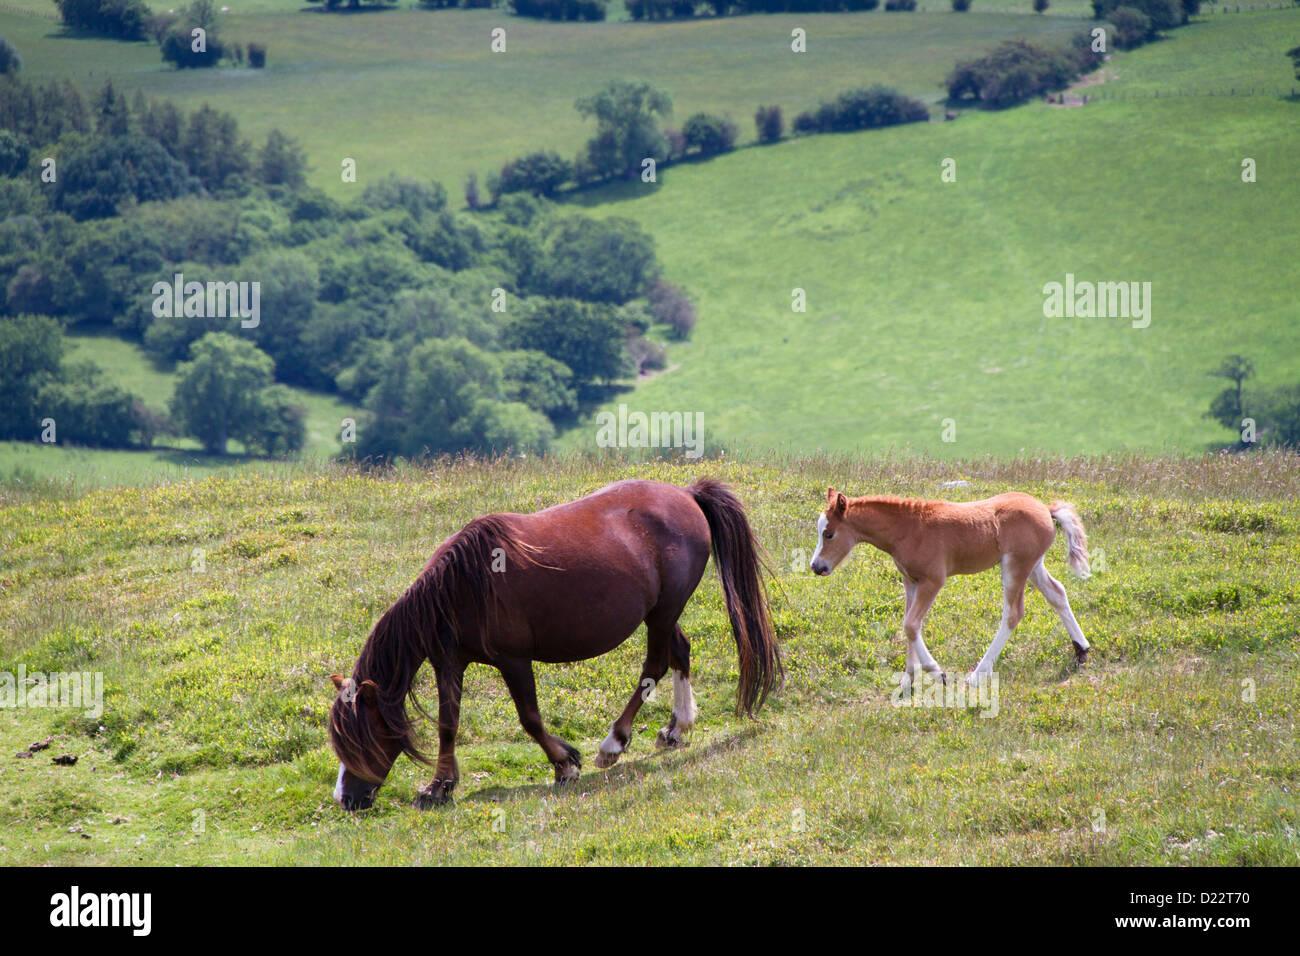 Pferd und faul. Stockbild